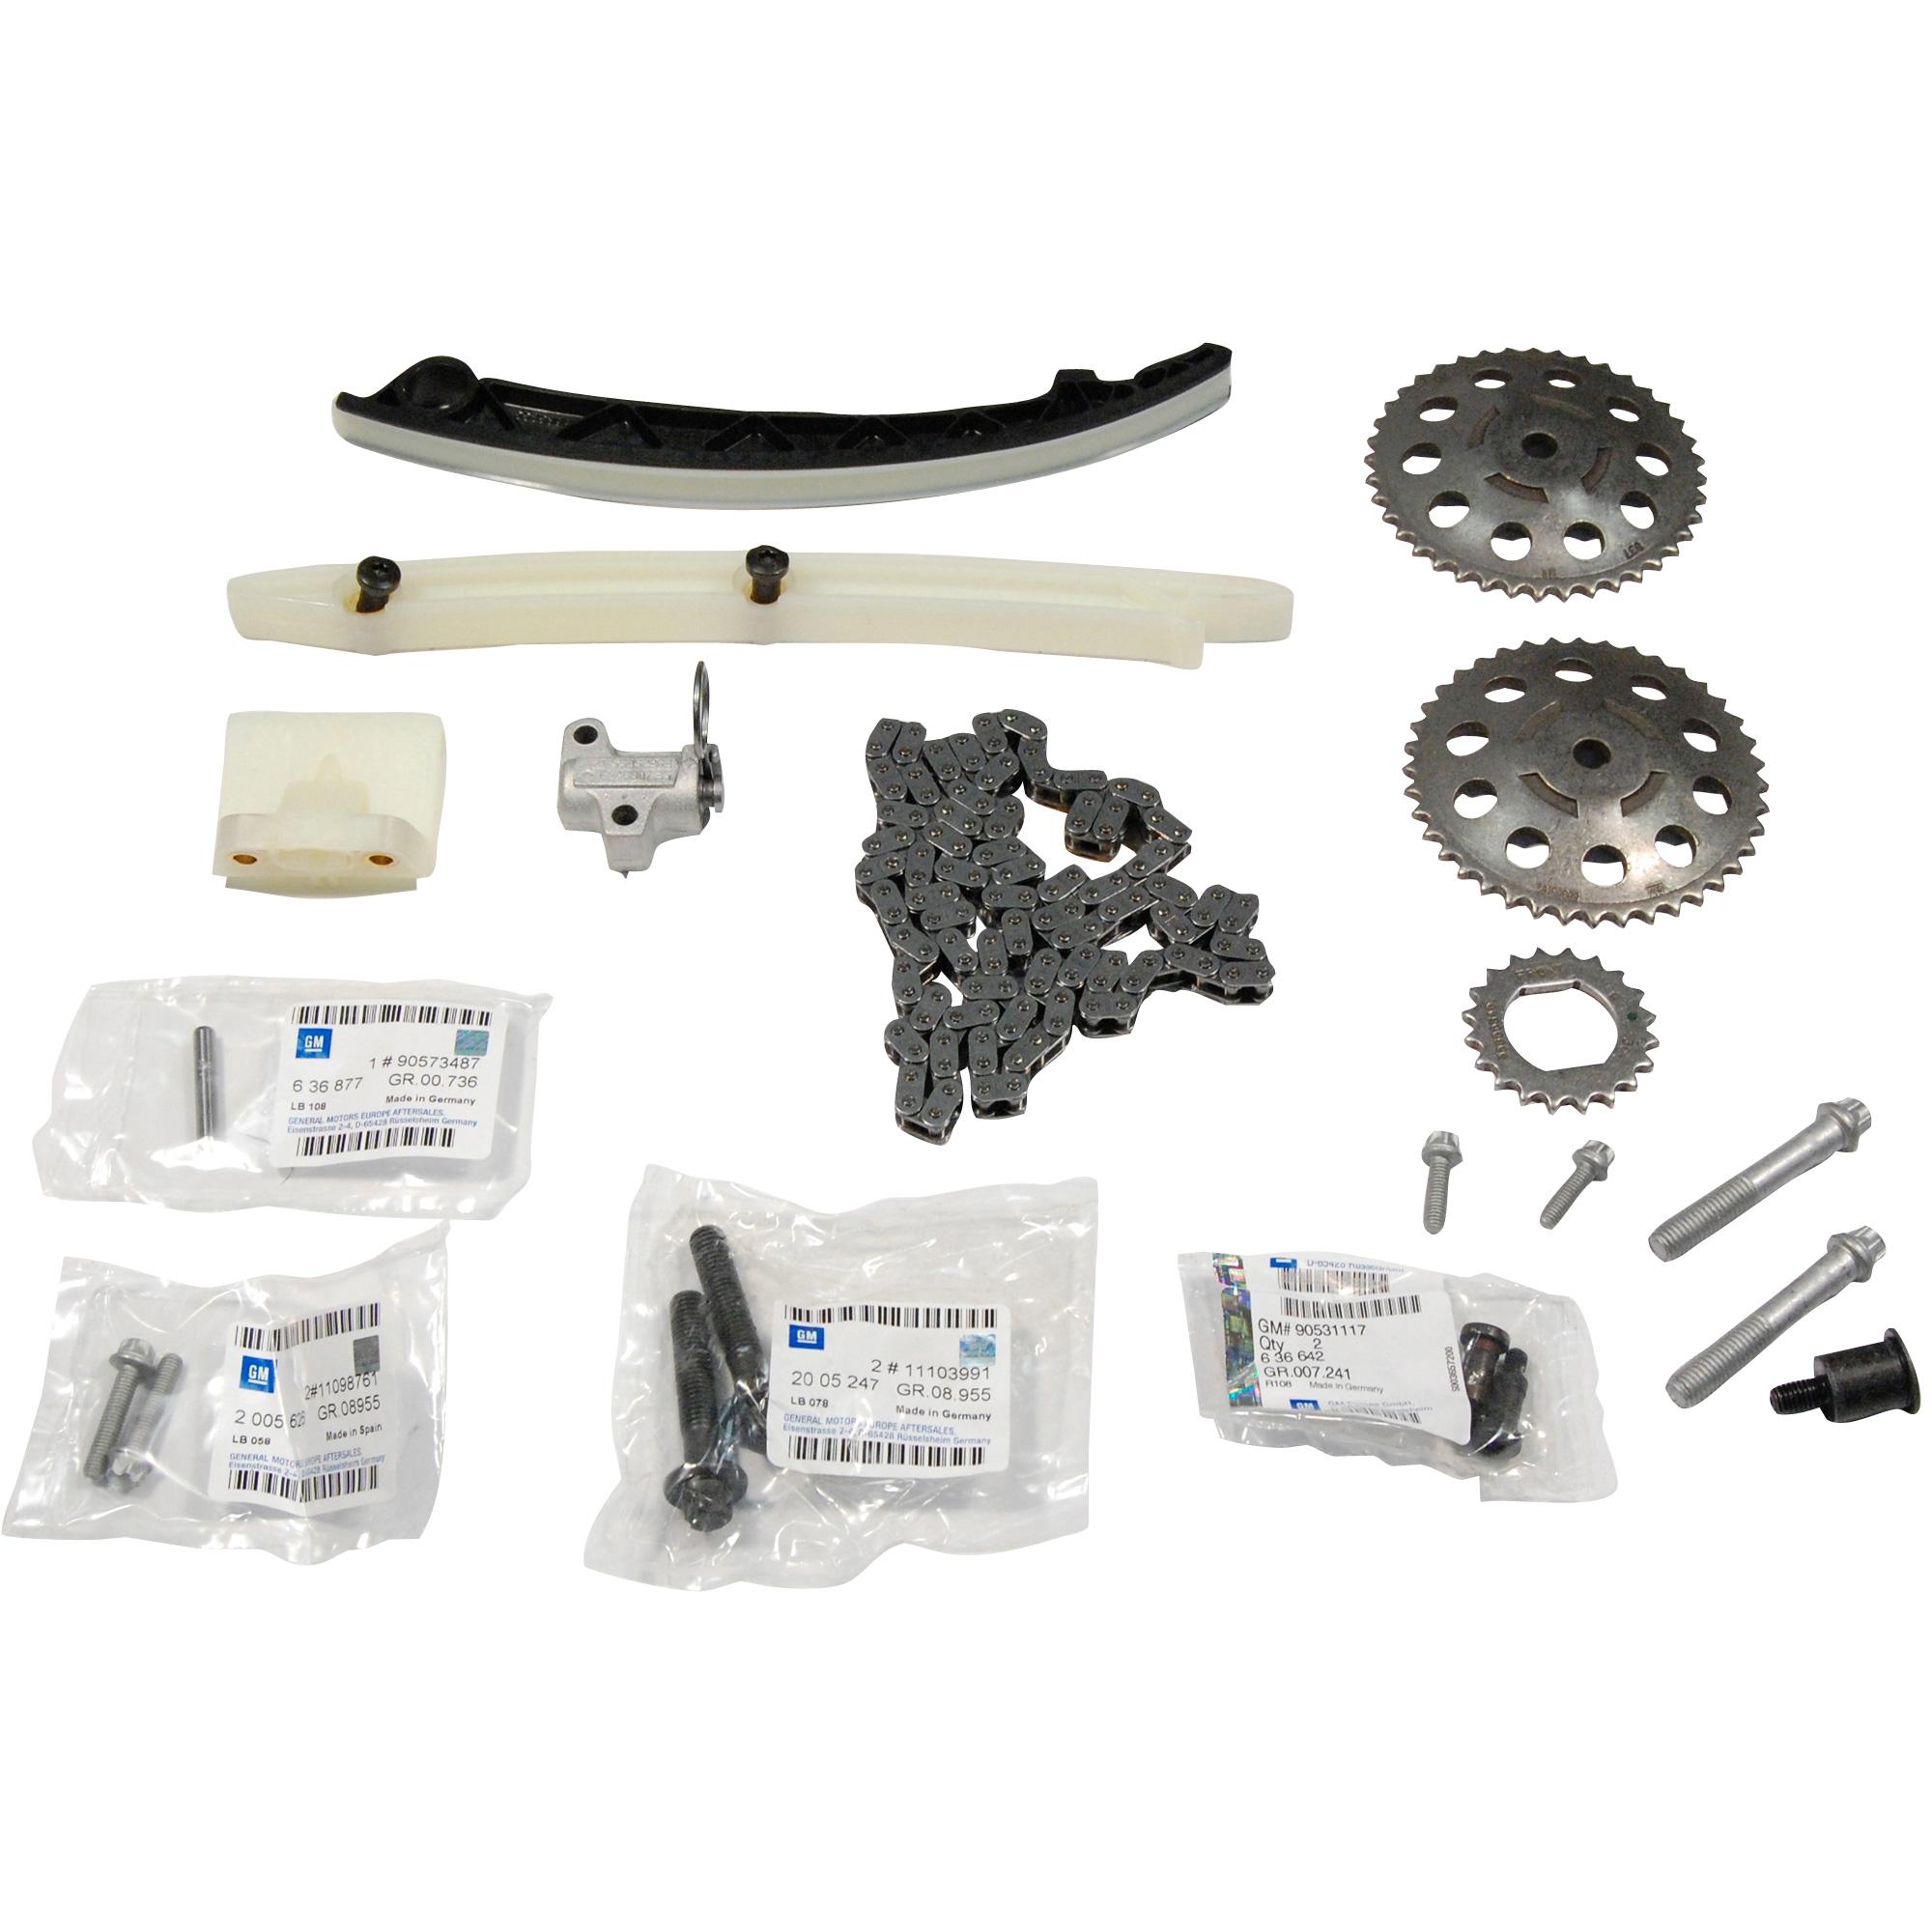 Kit distributie lant Opel Astra H, Corsa C, Meriva, Tigra B, Astra G, Agila A GM